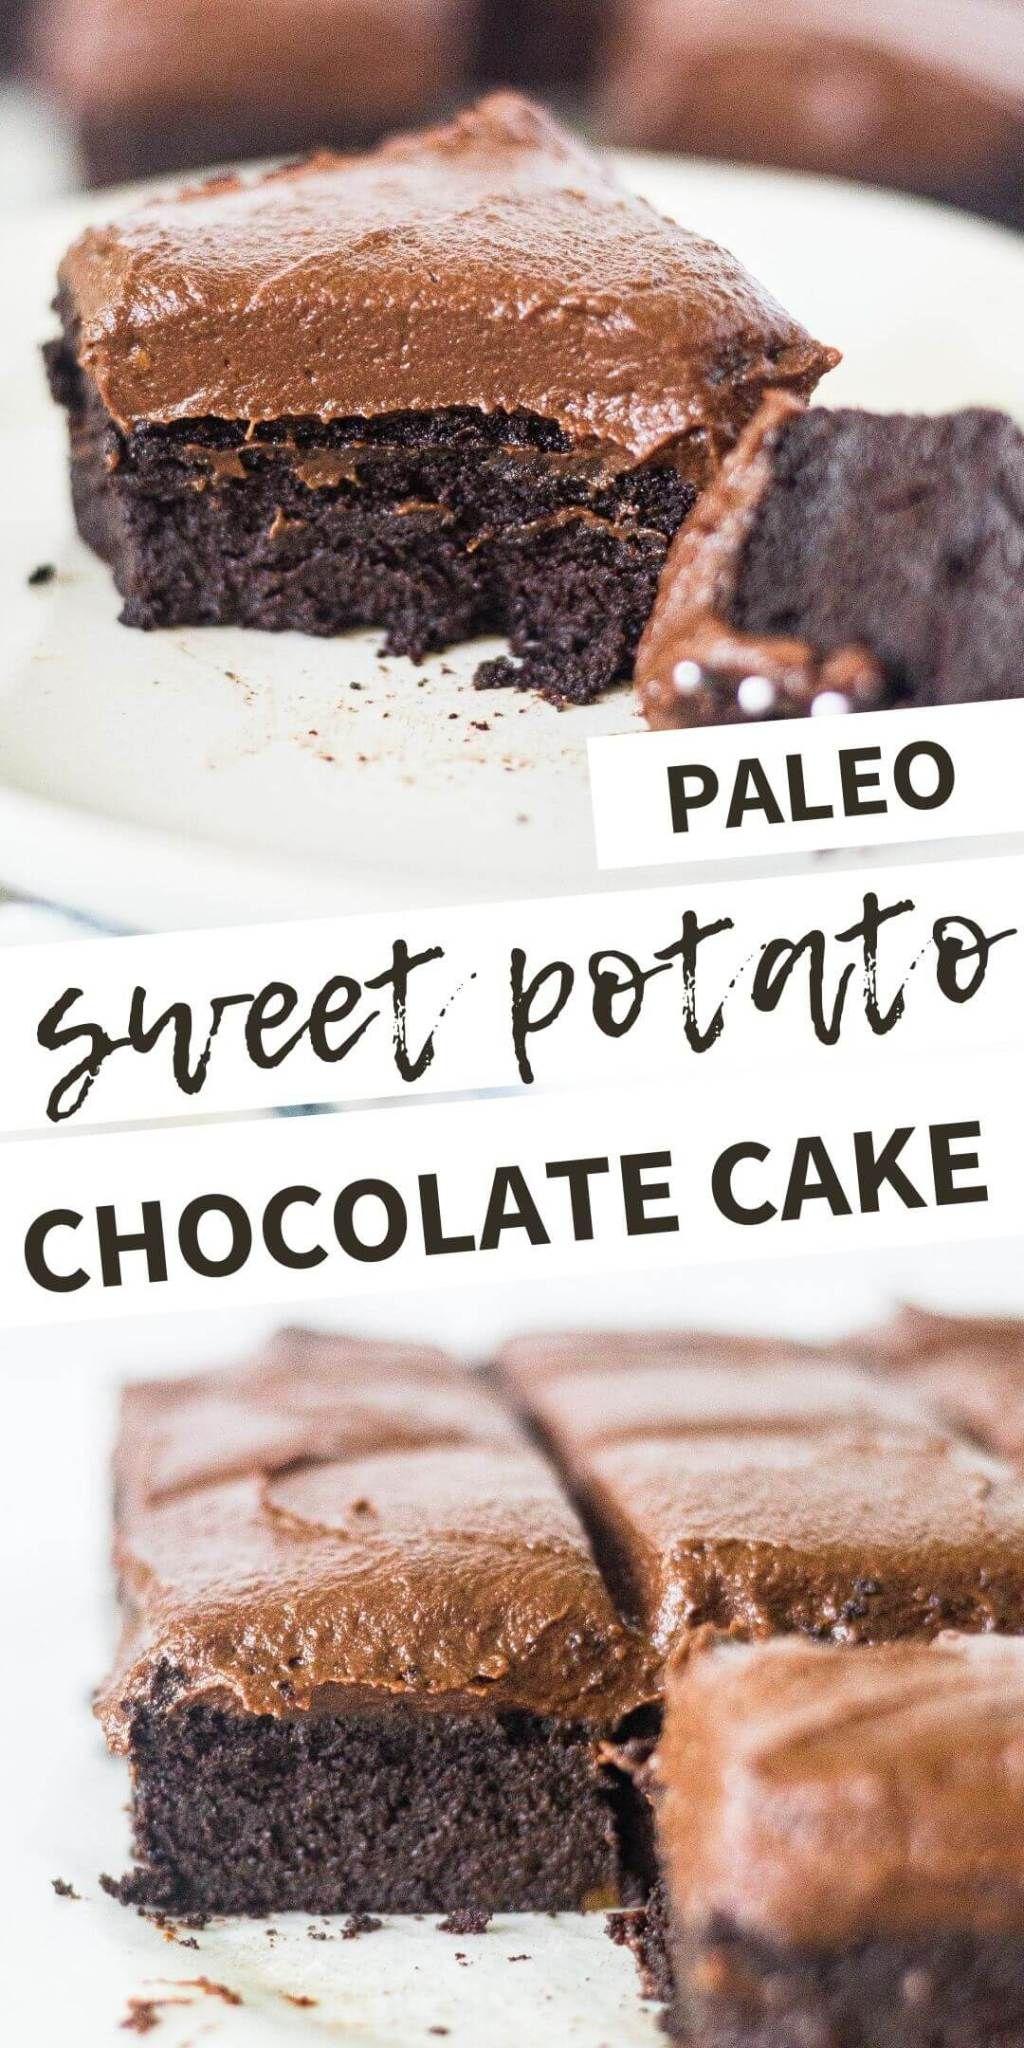 Sweet Potato Chocolate Cake [Gluten Free | Paleo]